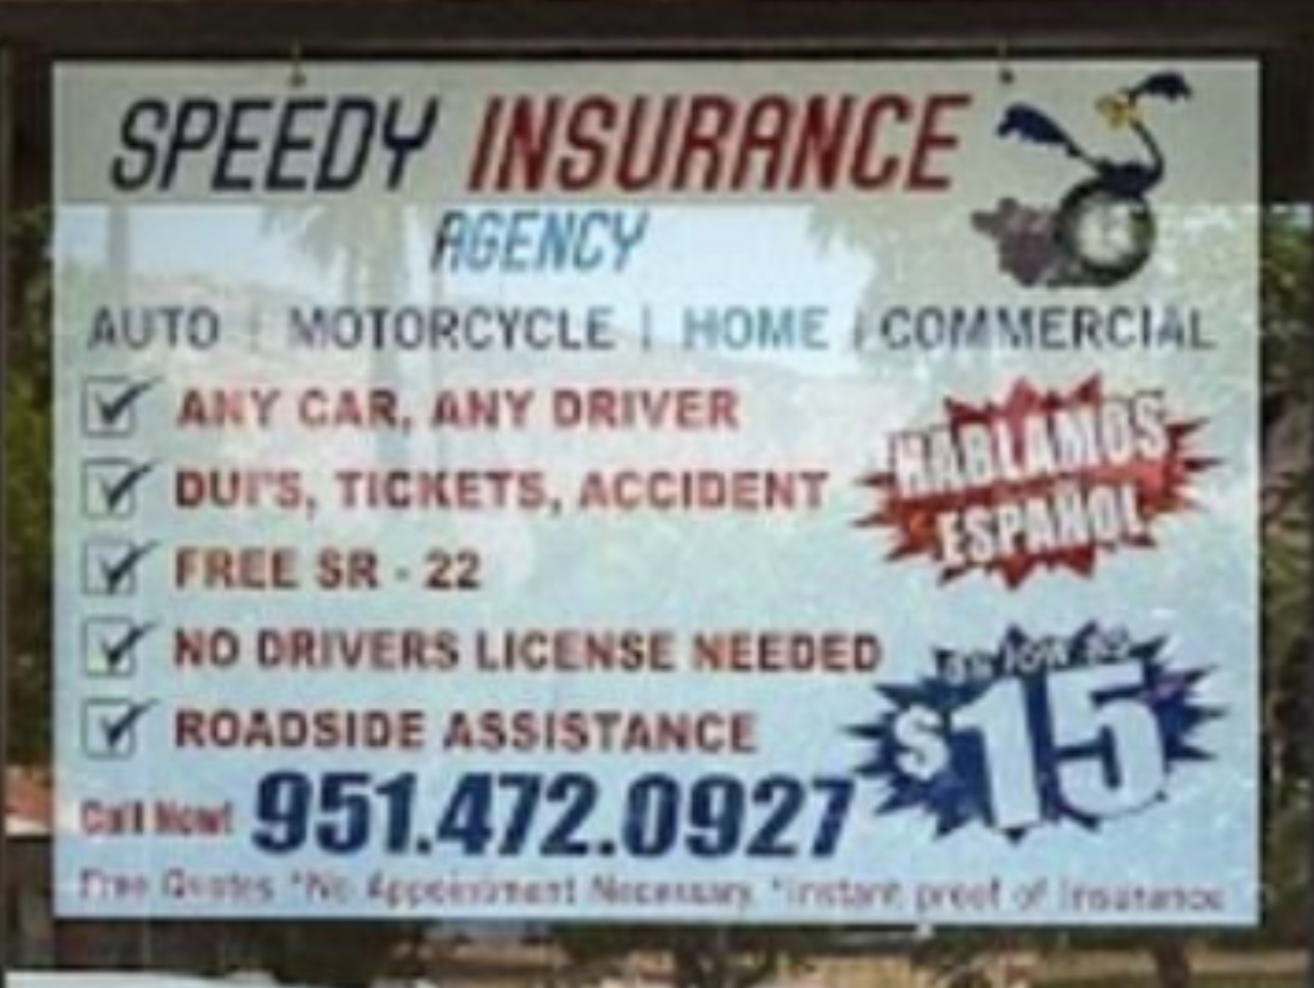 Speedy Insurance